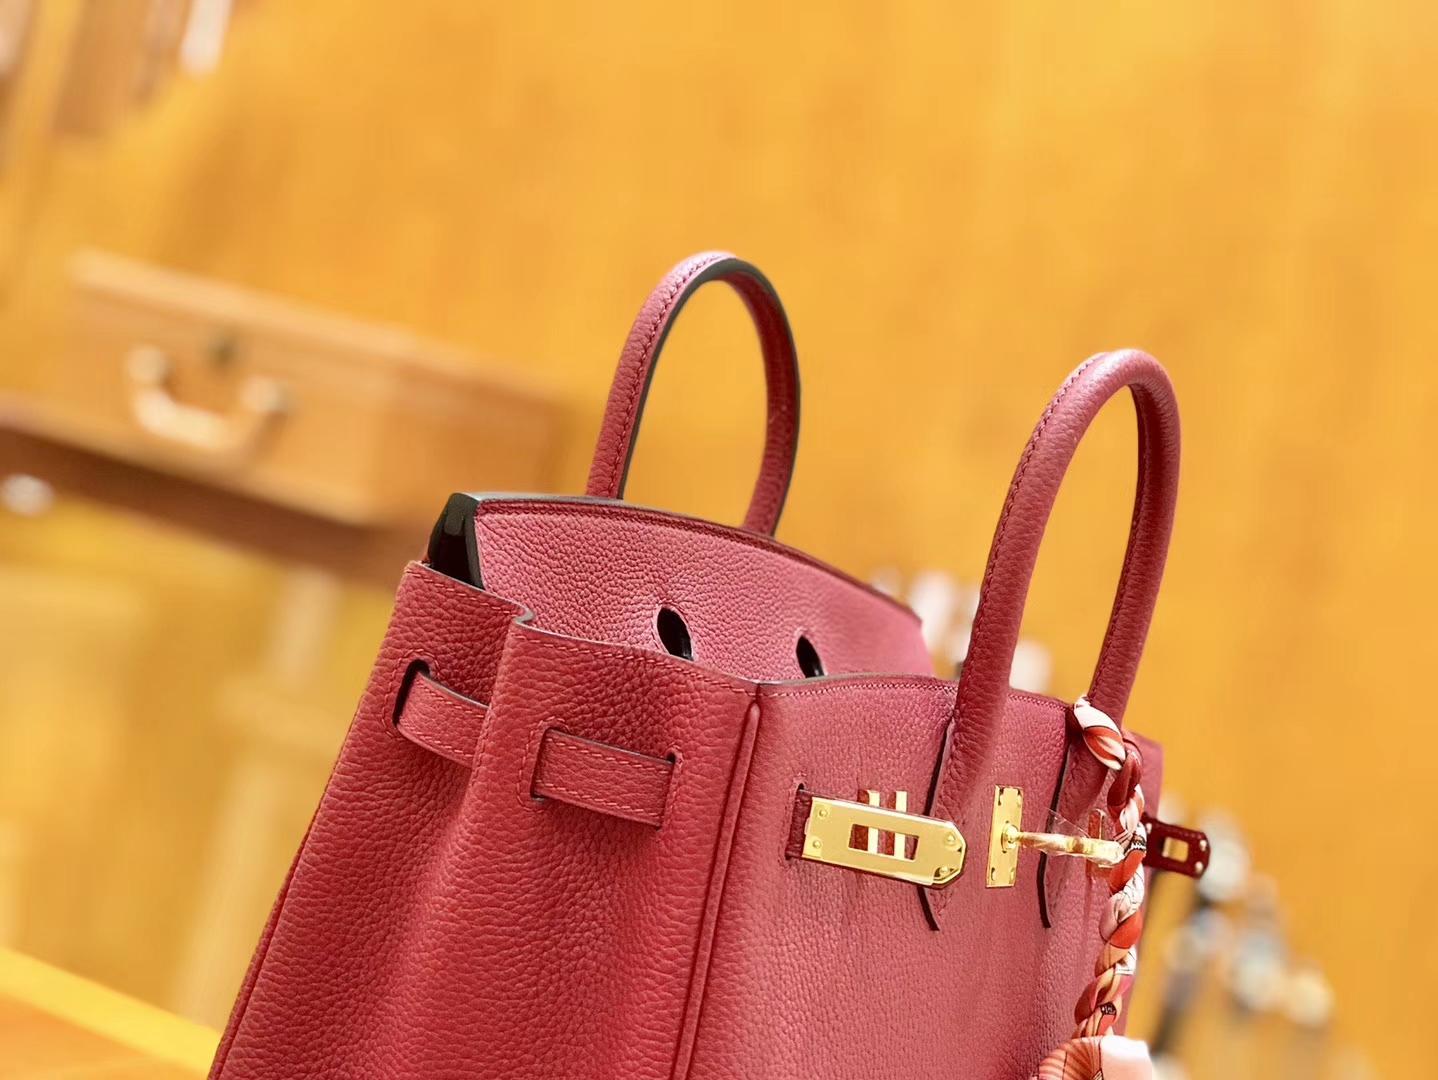 Hermès(爱马仕)Birkin 25cm 石榴红 金扣 全手工缝制